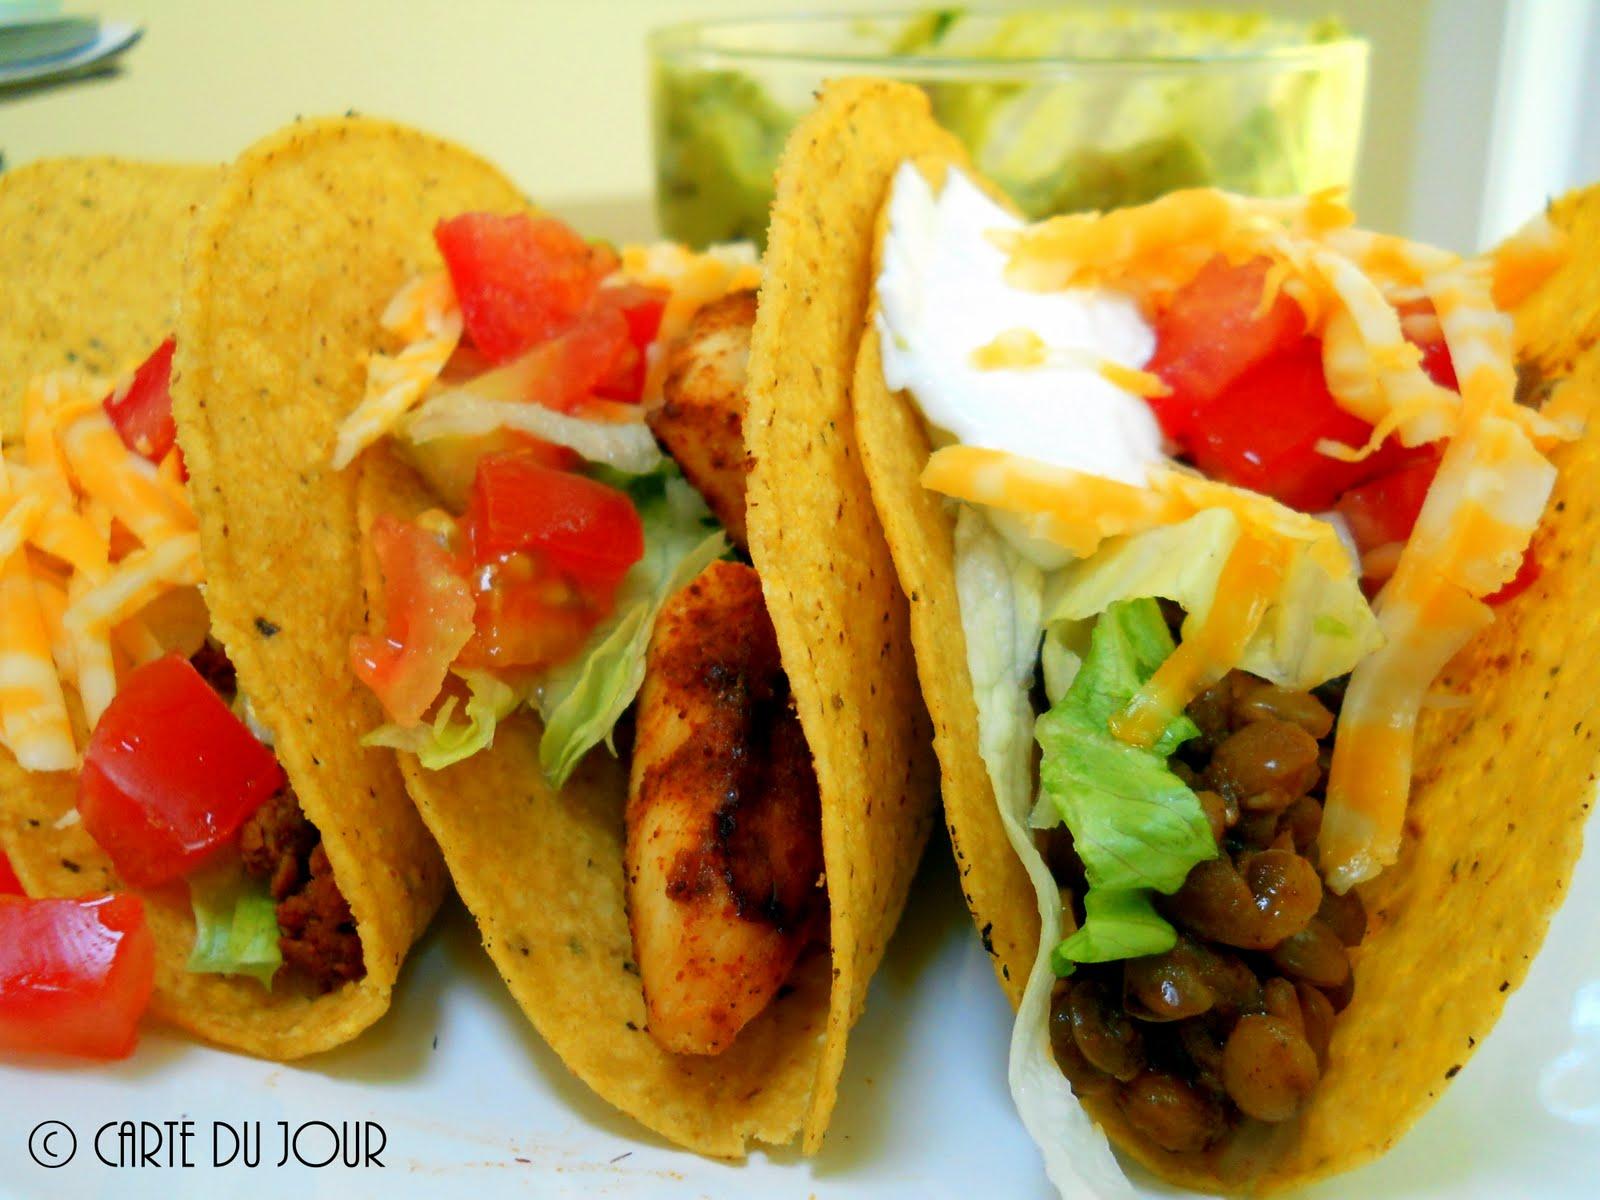 Carte du jour: A vegetarian taco that everyone can enjoy! Lentil Tacos